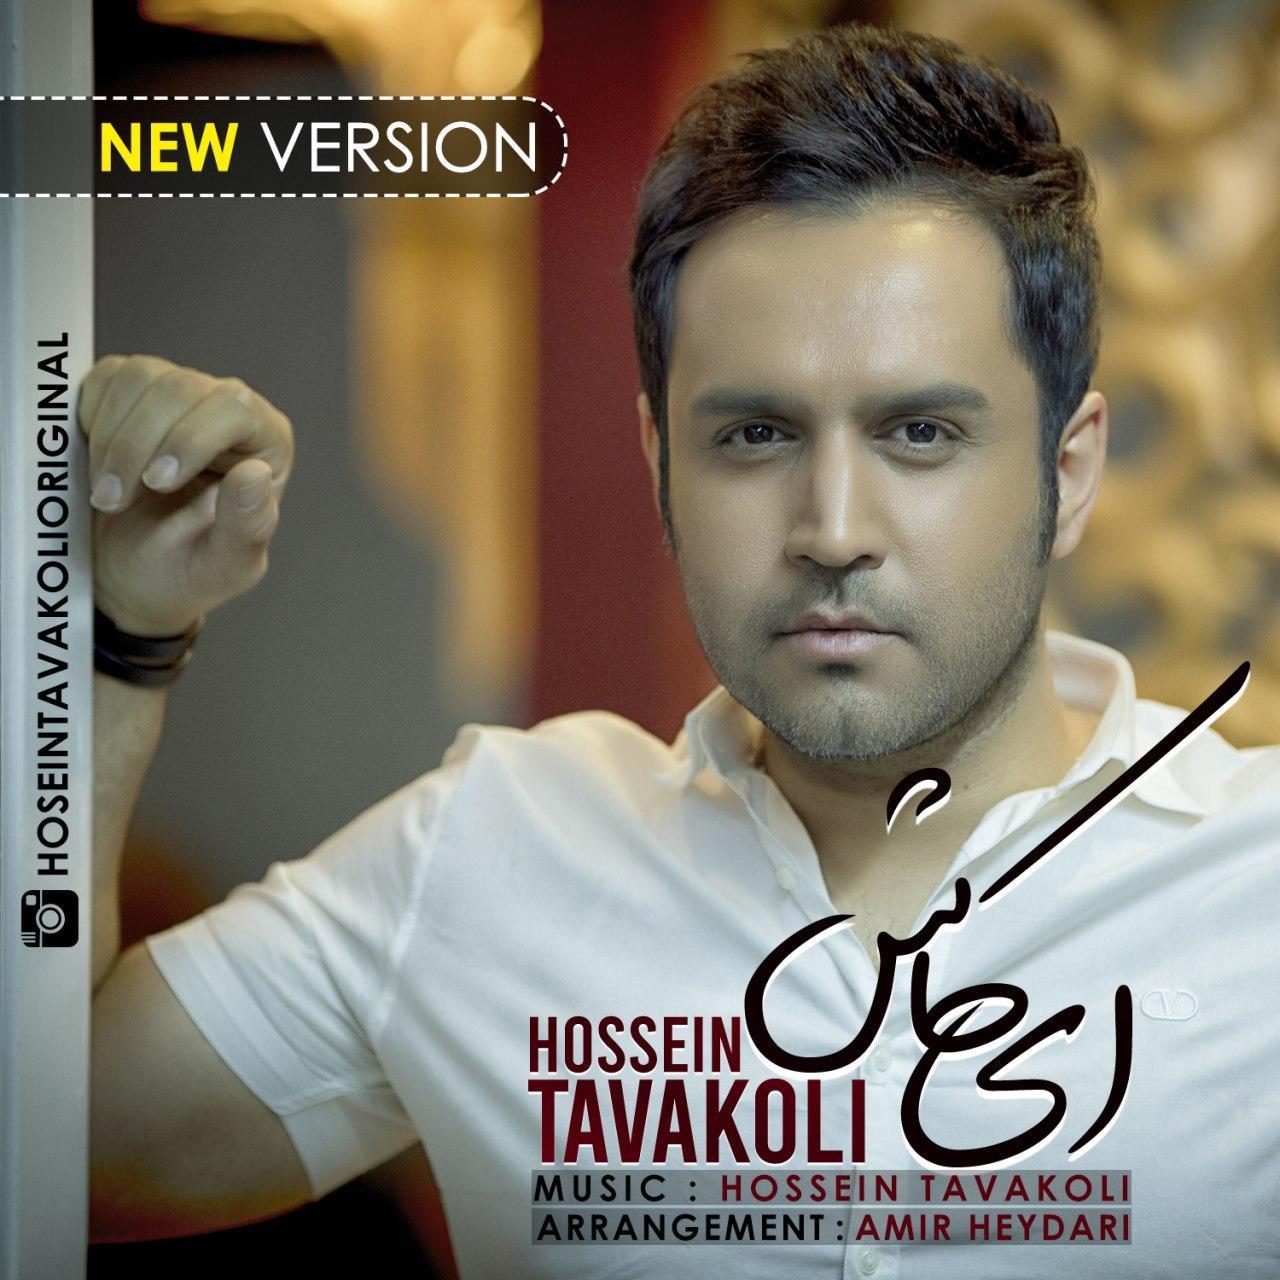 Hossein Tavakoli – Ey kash (New Version)